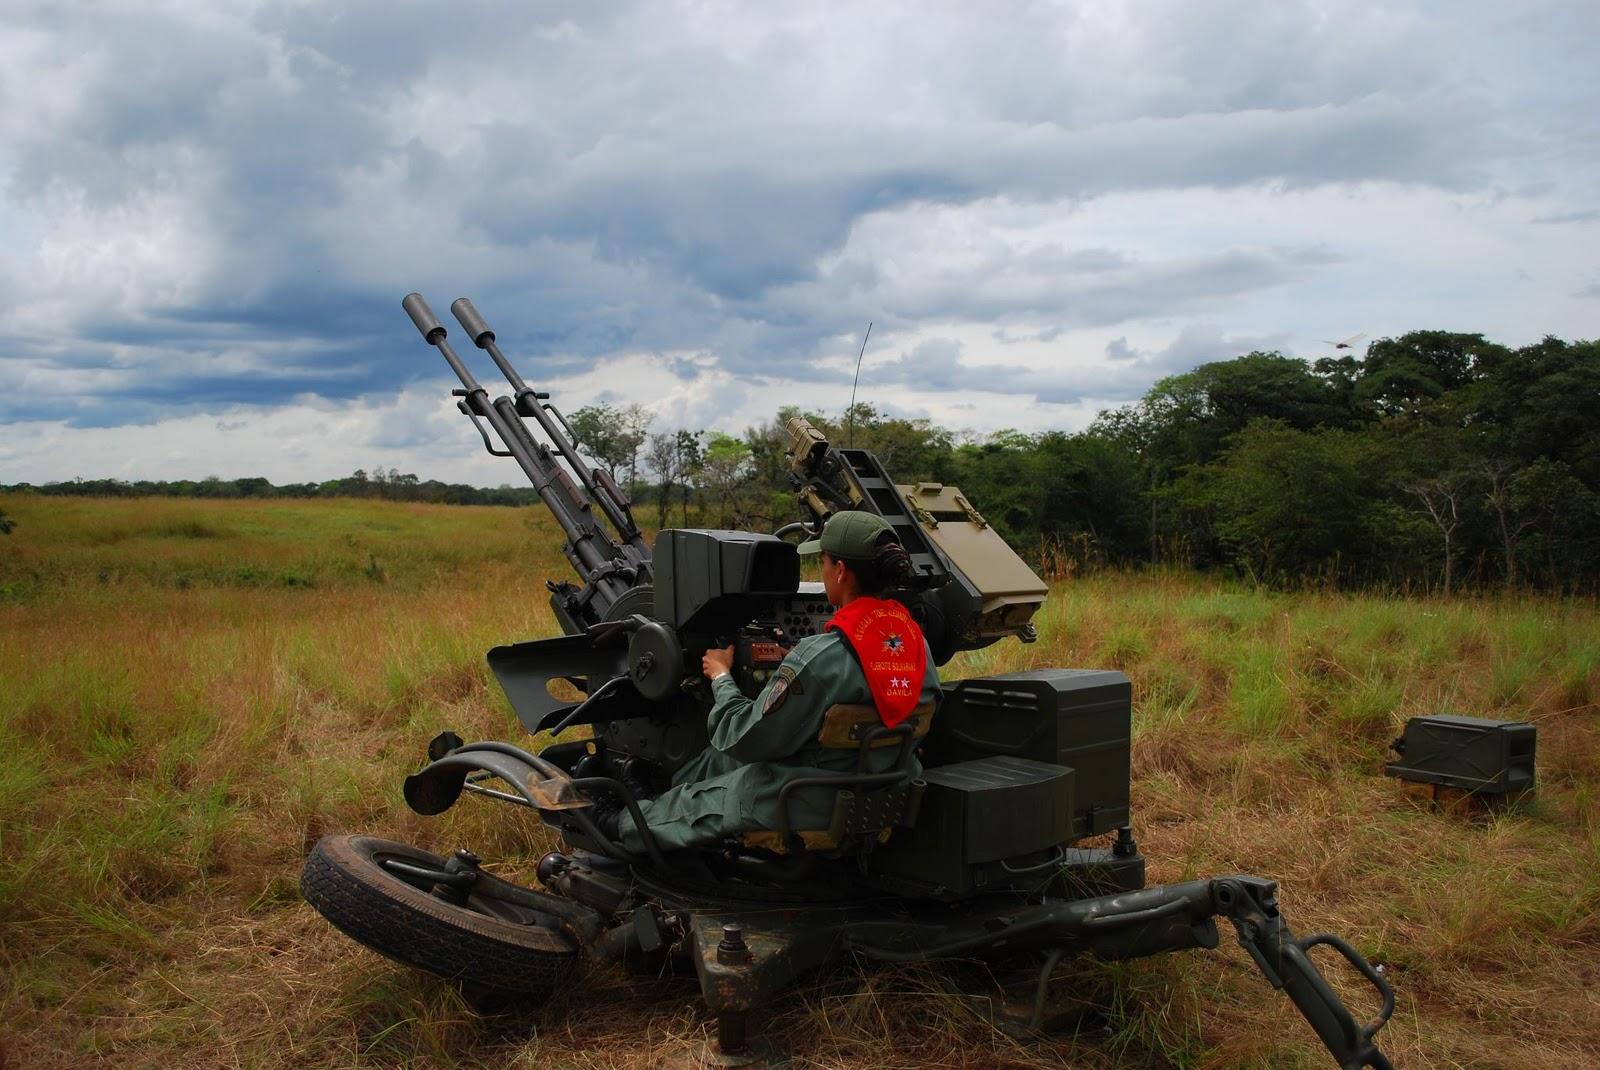 Piezas ZU-23-2/2A13 (ZU-23/ZOM-1-4) de 23mm Patria_Soberana-14